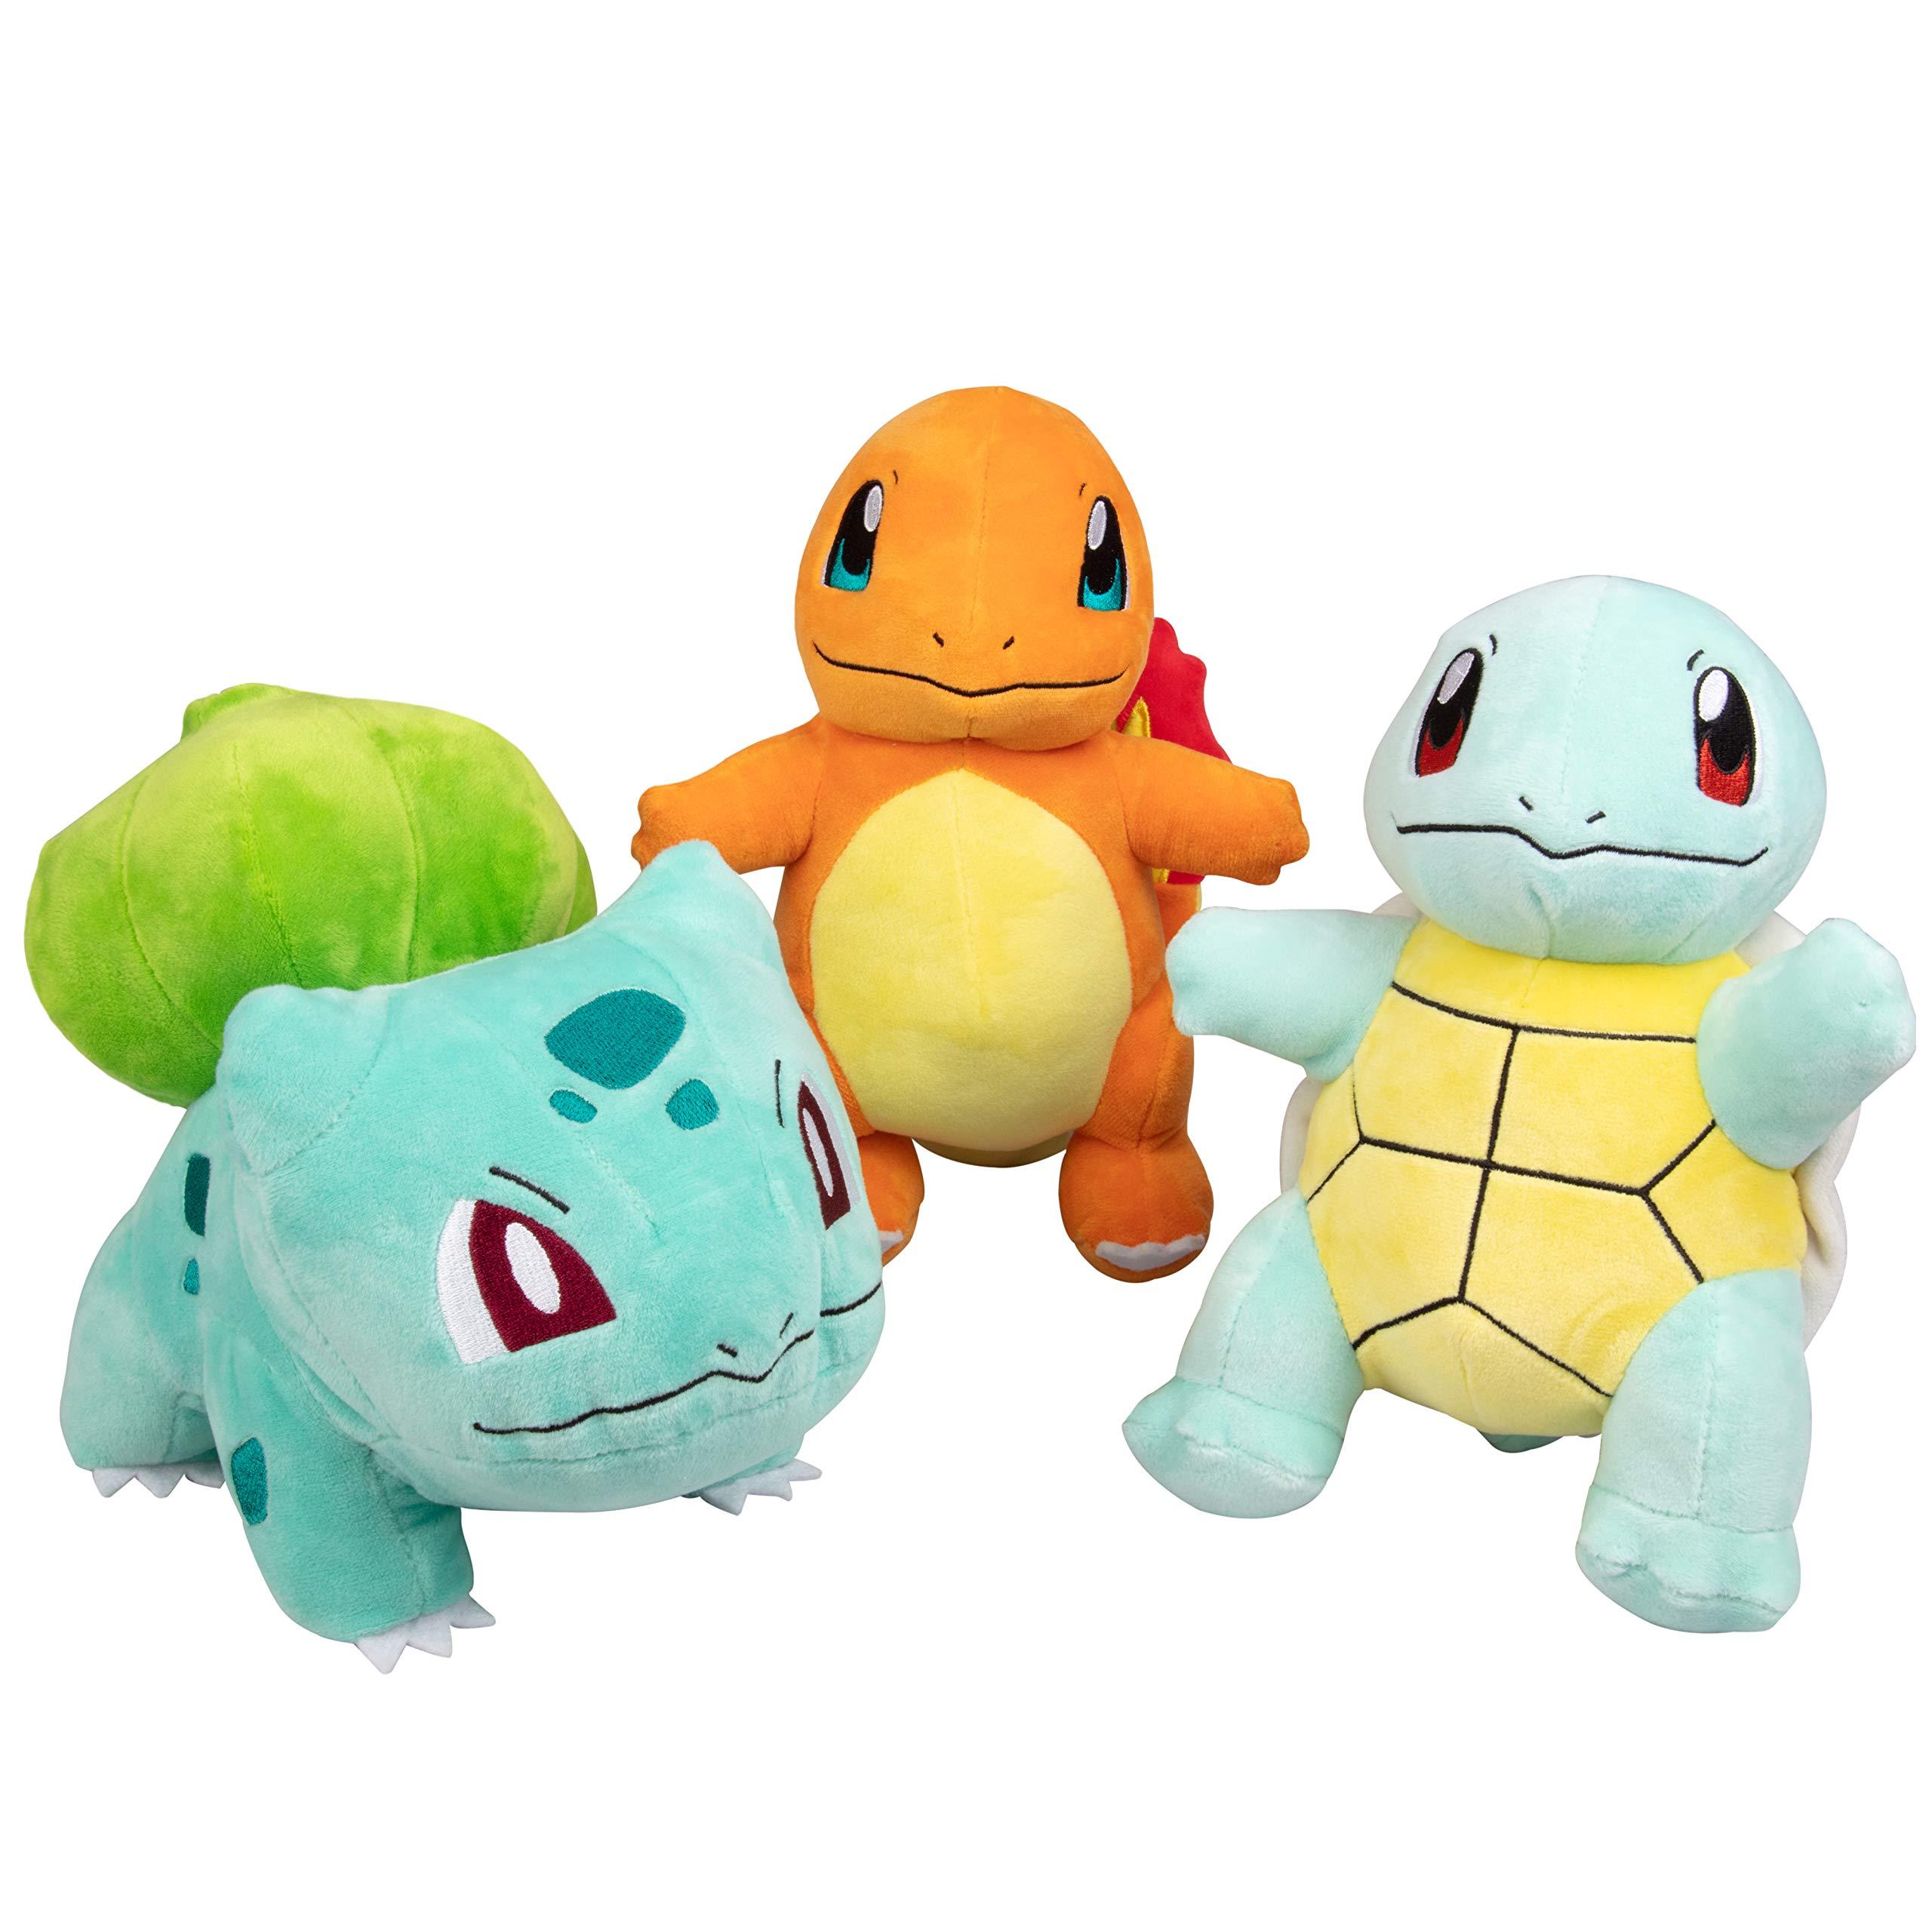 Pokémon Plush Starter 3 Pack - Charmander, Squirtle & Bulbasaur 8'' Generation One Stuffed Animals by Pokemon